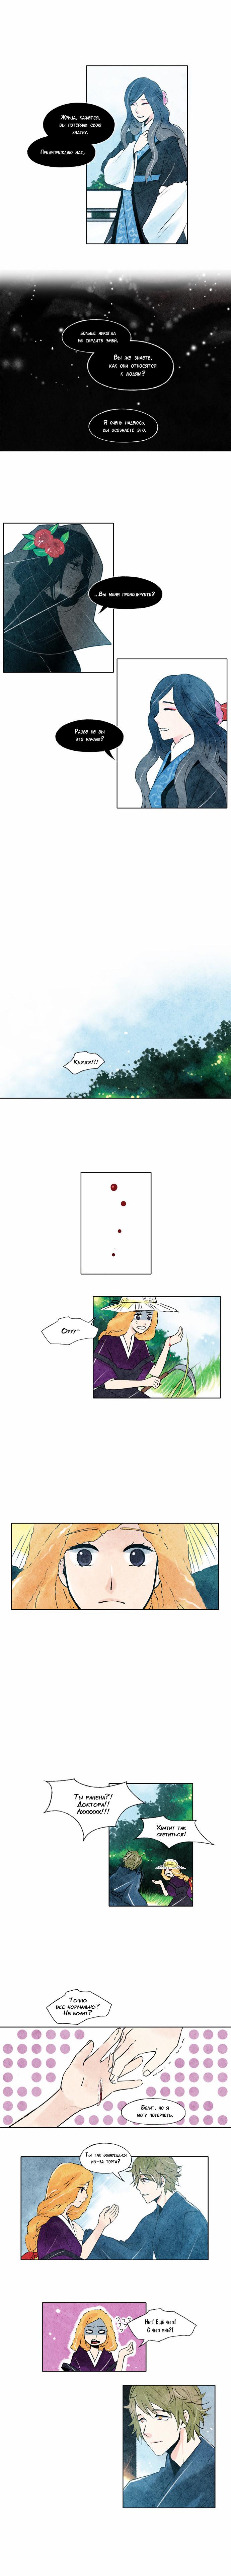 https://r1.ninemanga.com/comics/pic2/39/22503/416377/1532884297994.jpg Page 3